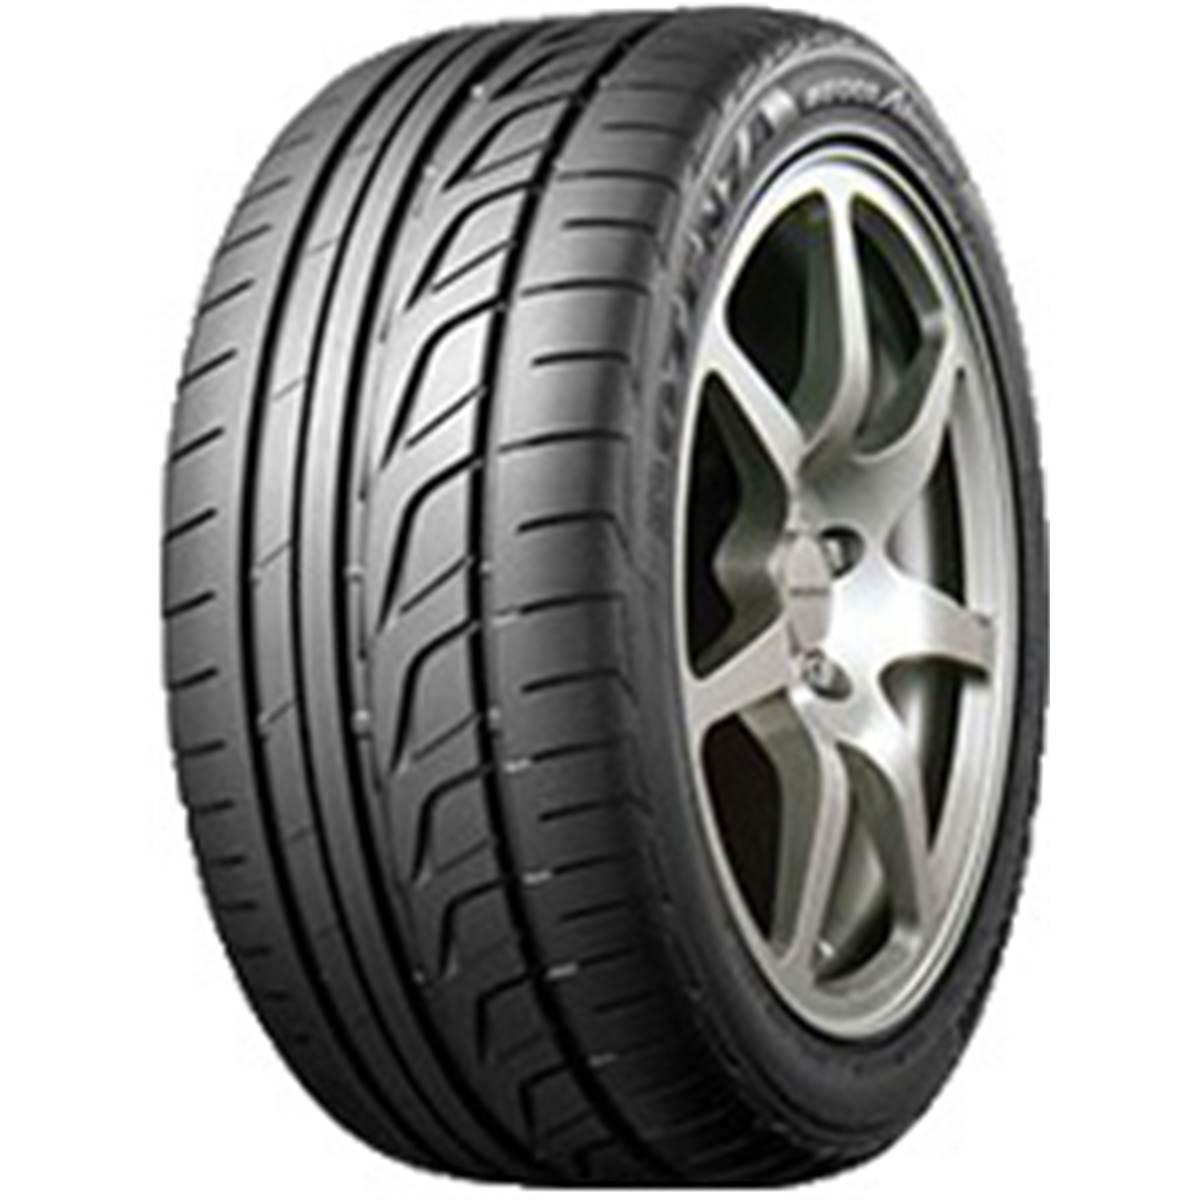 Pneu Bridgestone 205/55R16 91W Potenza Adrenalin Re002